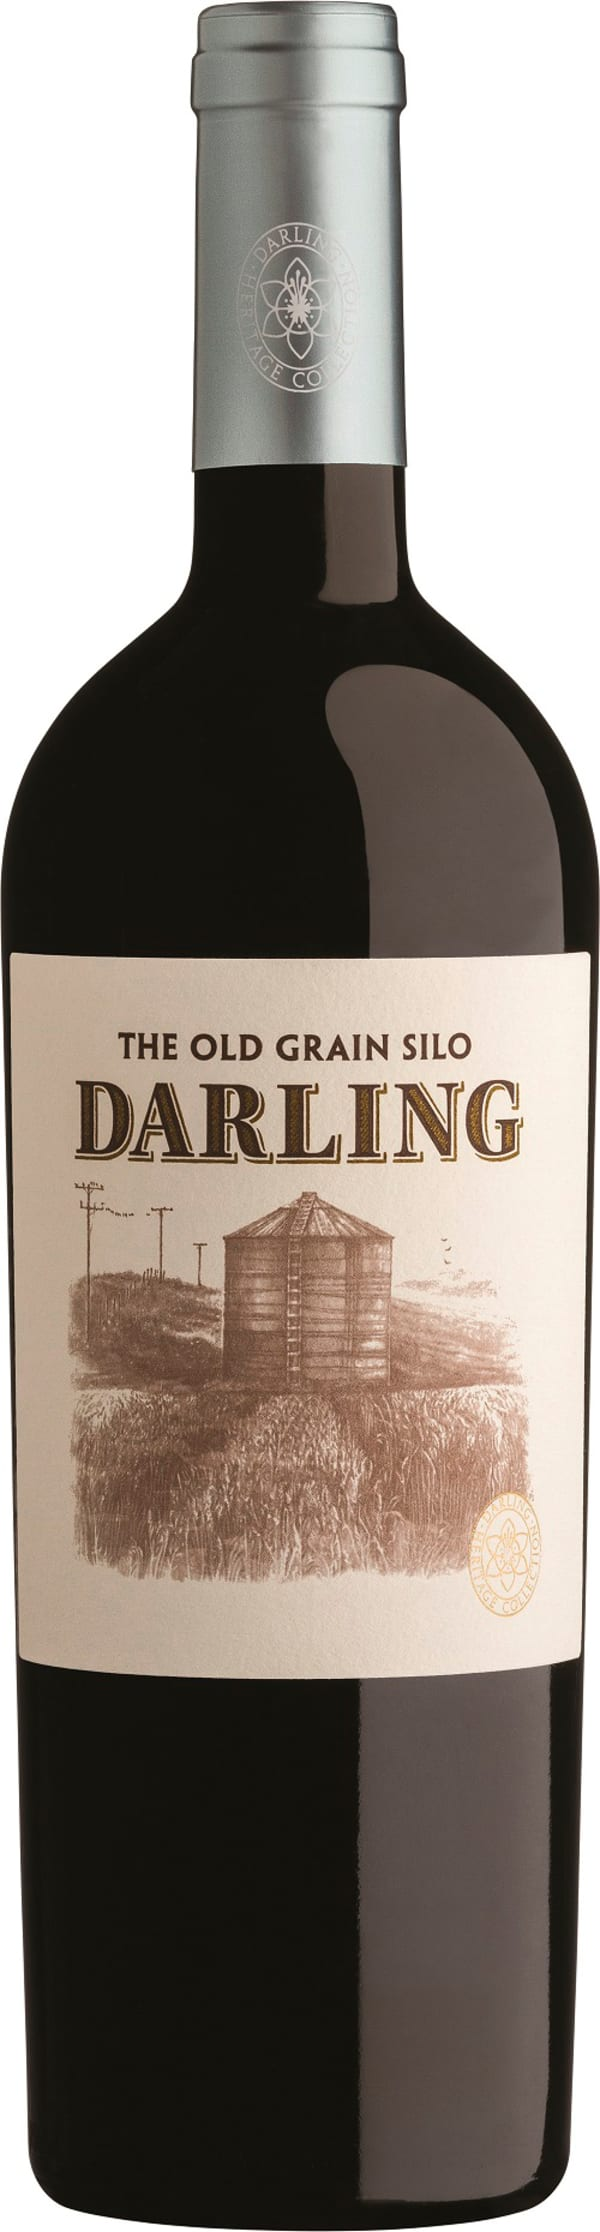 Darling Cellars The Old Grain Silo 2017